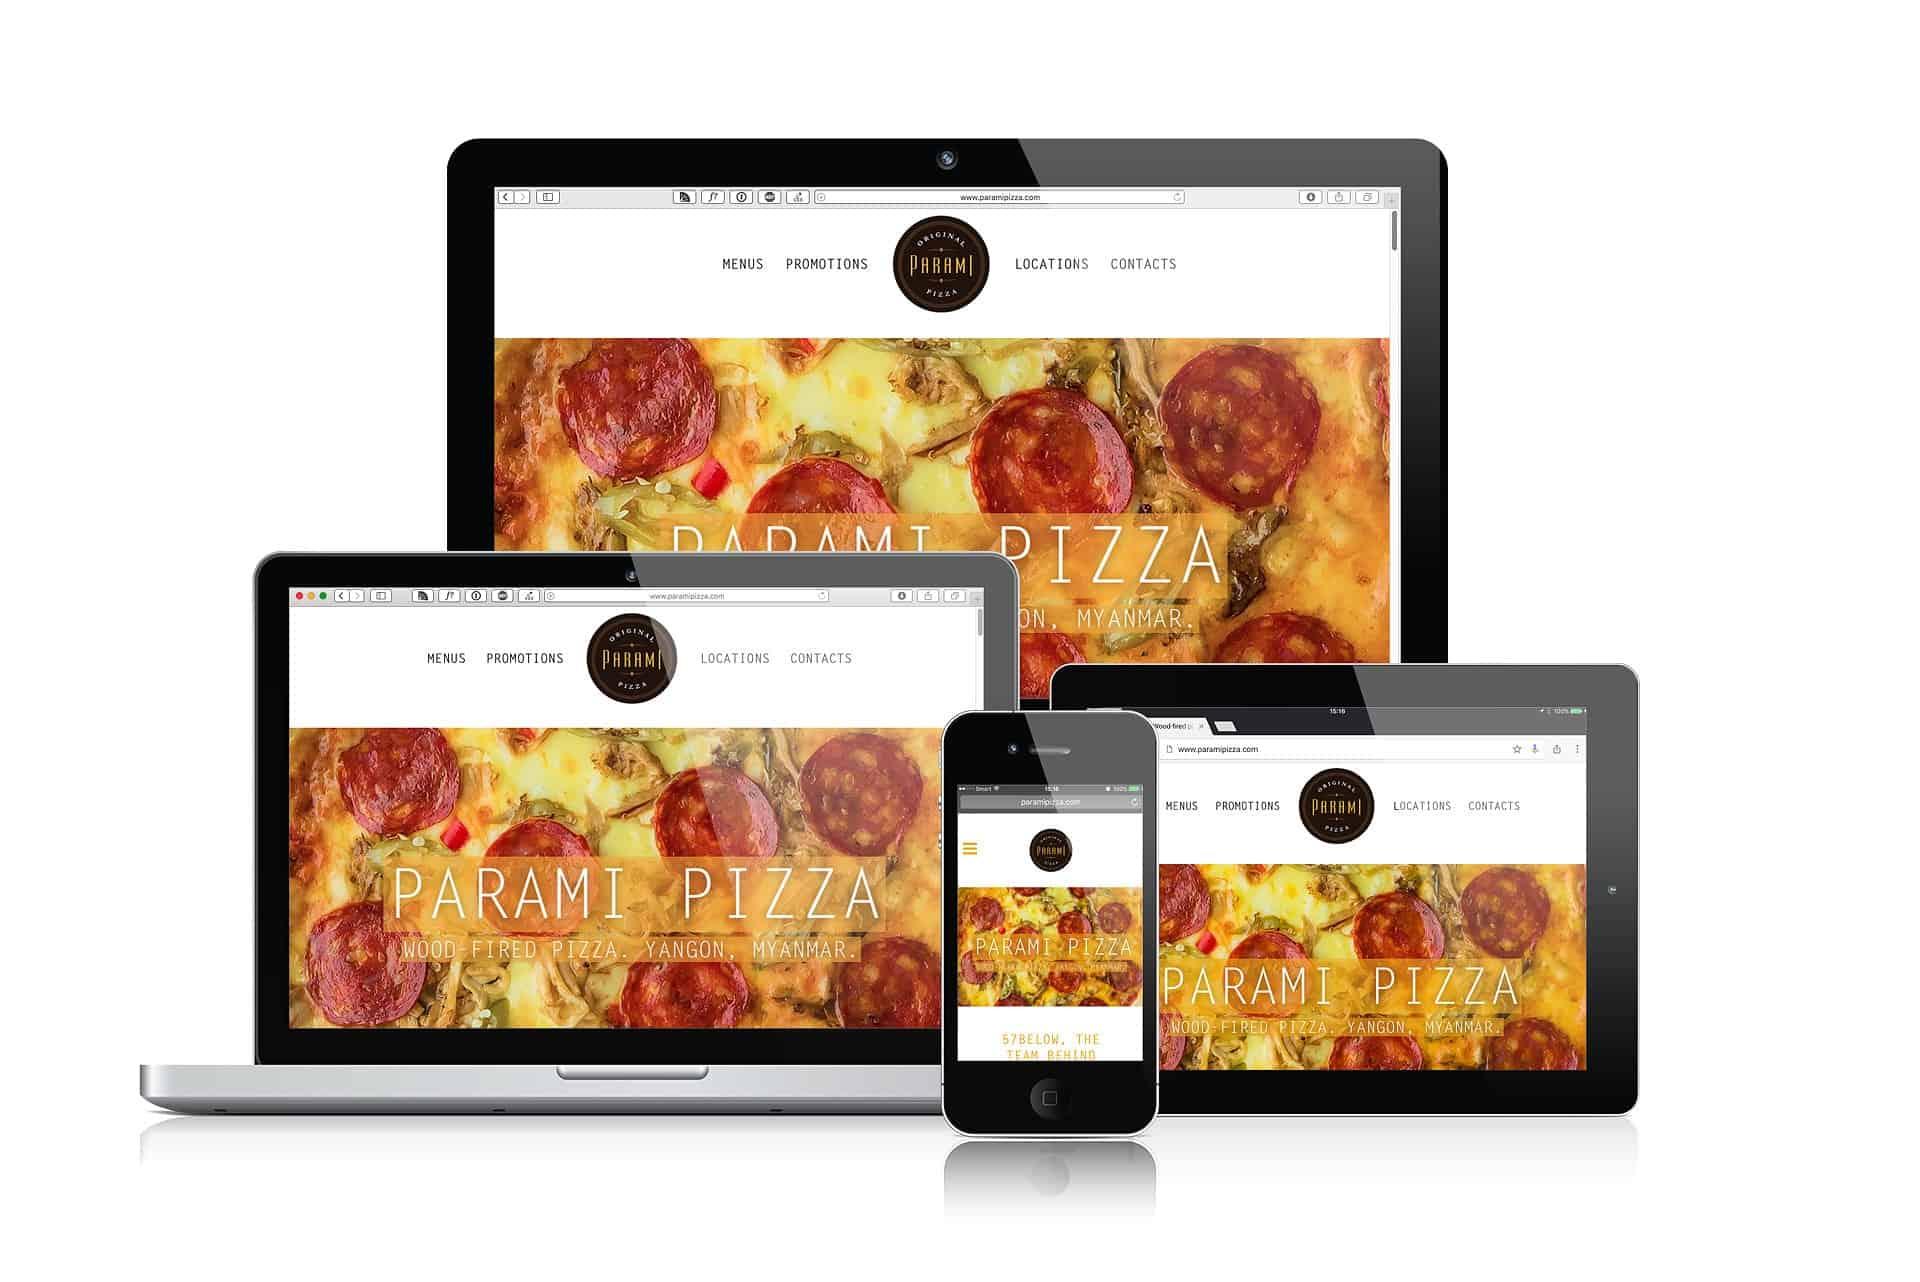 Parami Pizza, Myanmar (Burma) Website. Web Design & Development by Grantourismo Media, a Full Service Digital Media Agency.